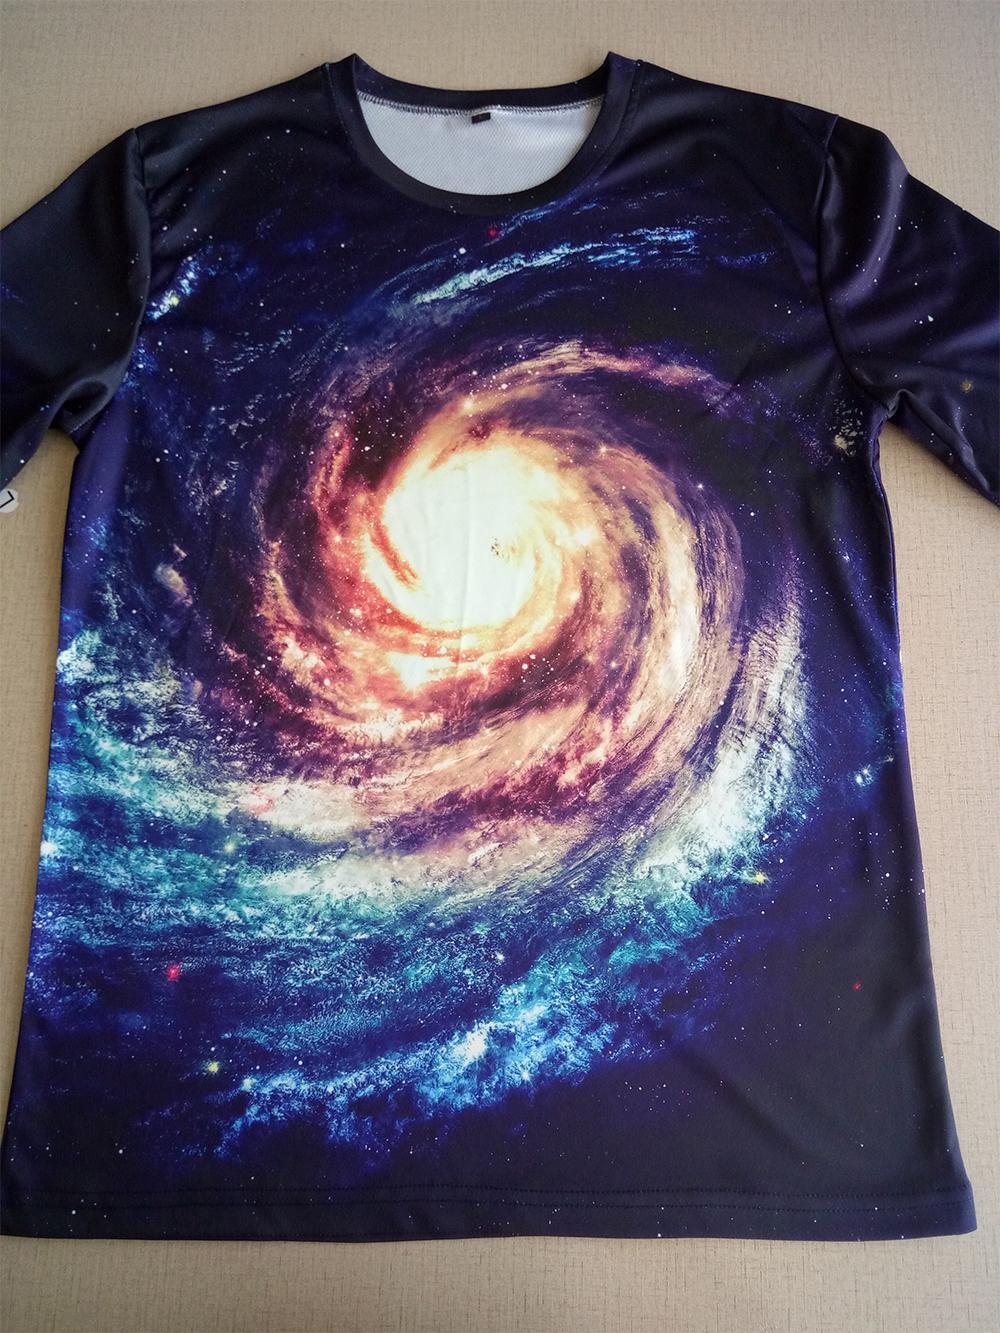 HTB1PPmZSFXXXXbbXFXXq6xXFXXXf - Galaxy Shirt Space T Shirt Men Short Sleeve 3d T-shirts Print Nebula T-shirt Fashion Brand Clothing Summer Tops Tees Cool Sim